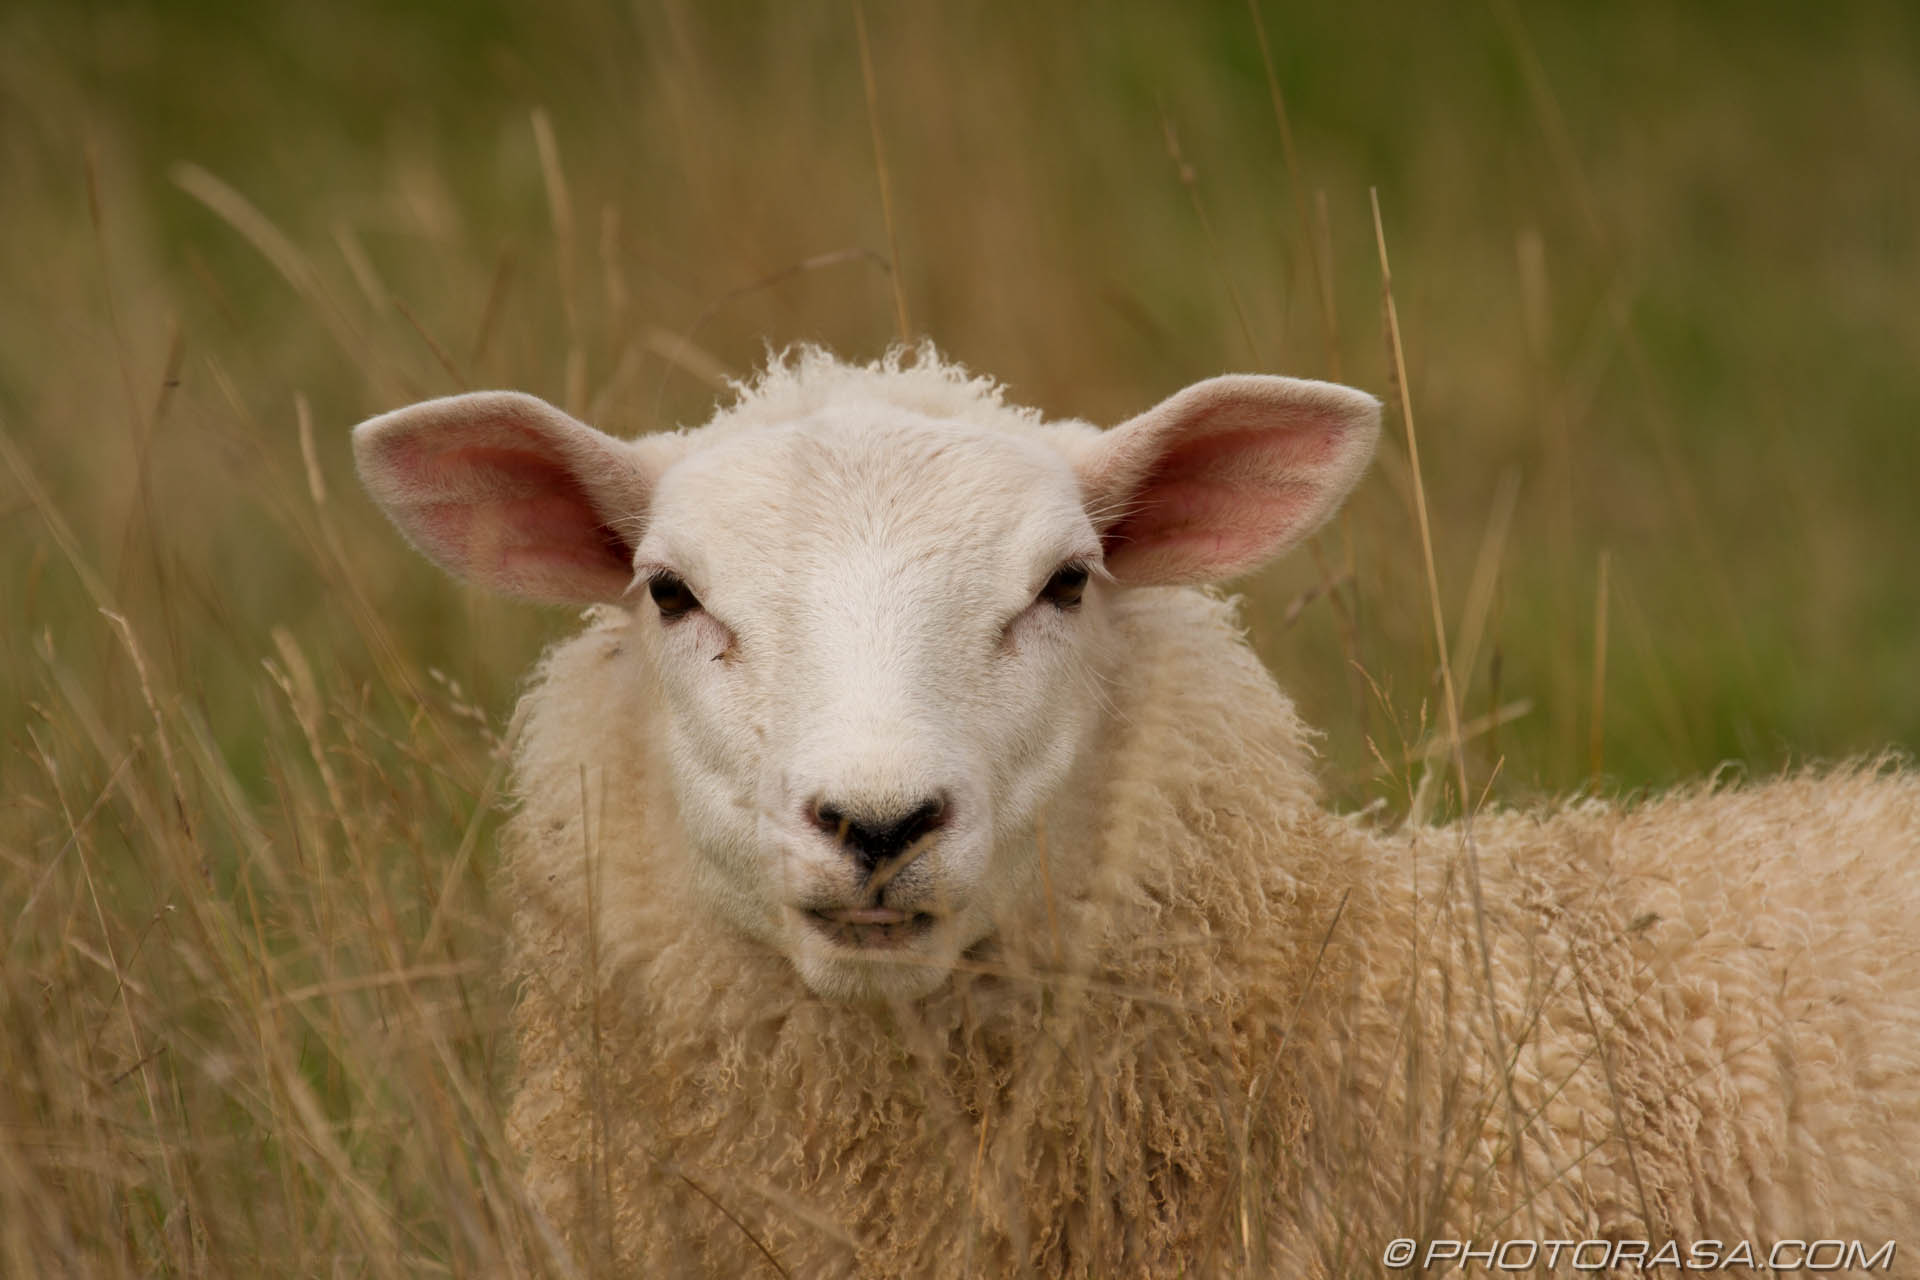 http://photorasa.com/sheep/sheep-in-the-long-grass/